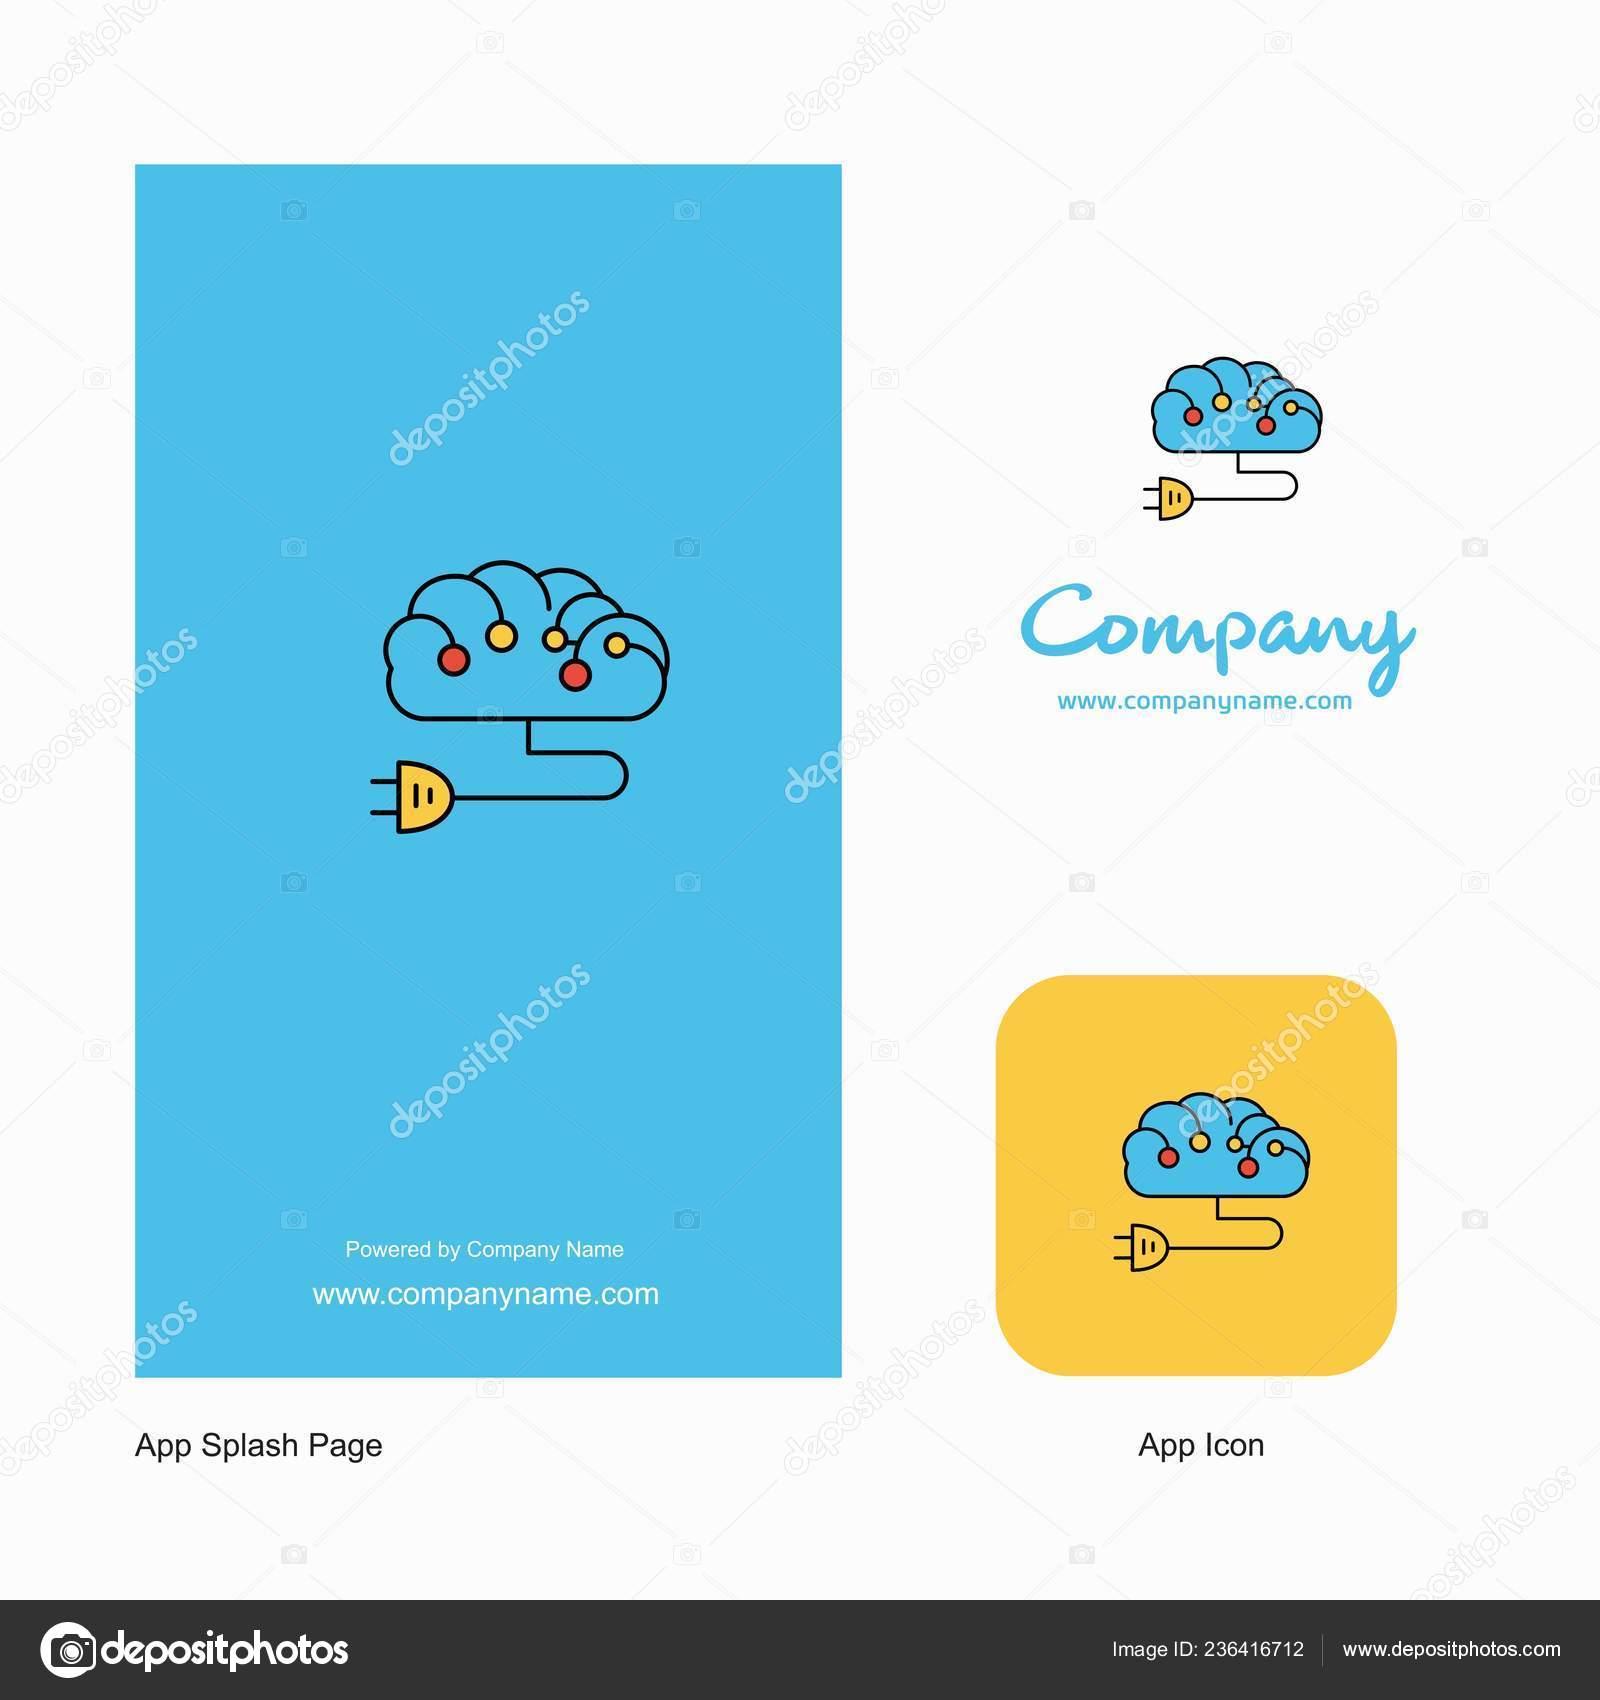 Brain Circuit Company Logo App Icon Splash Page Design